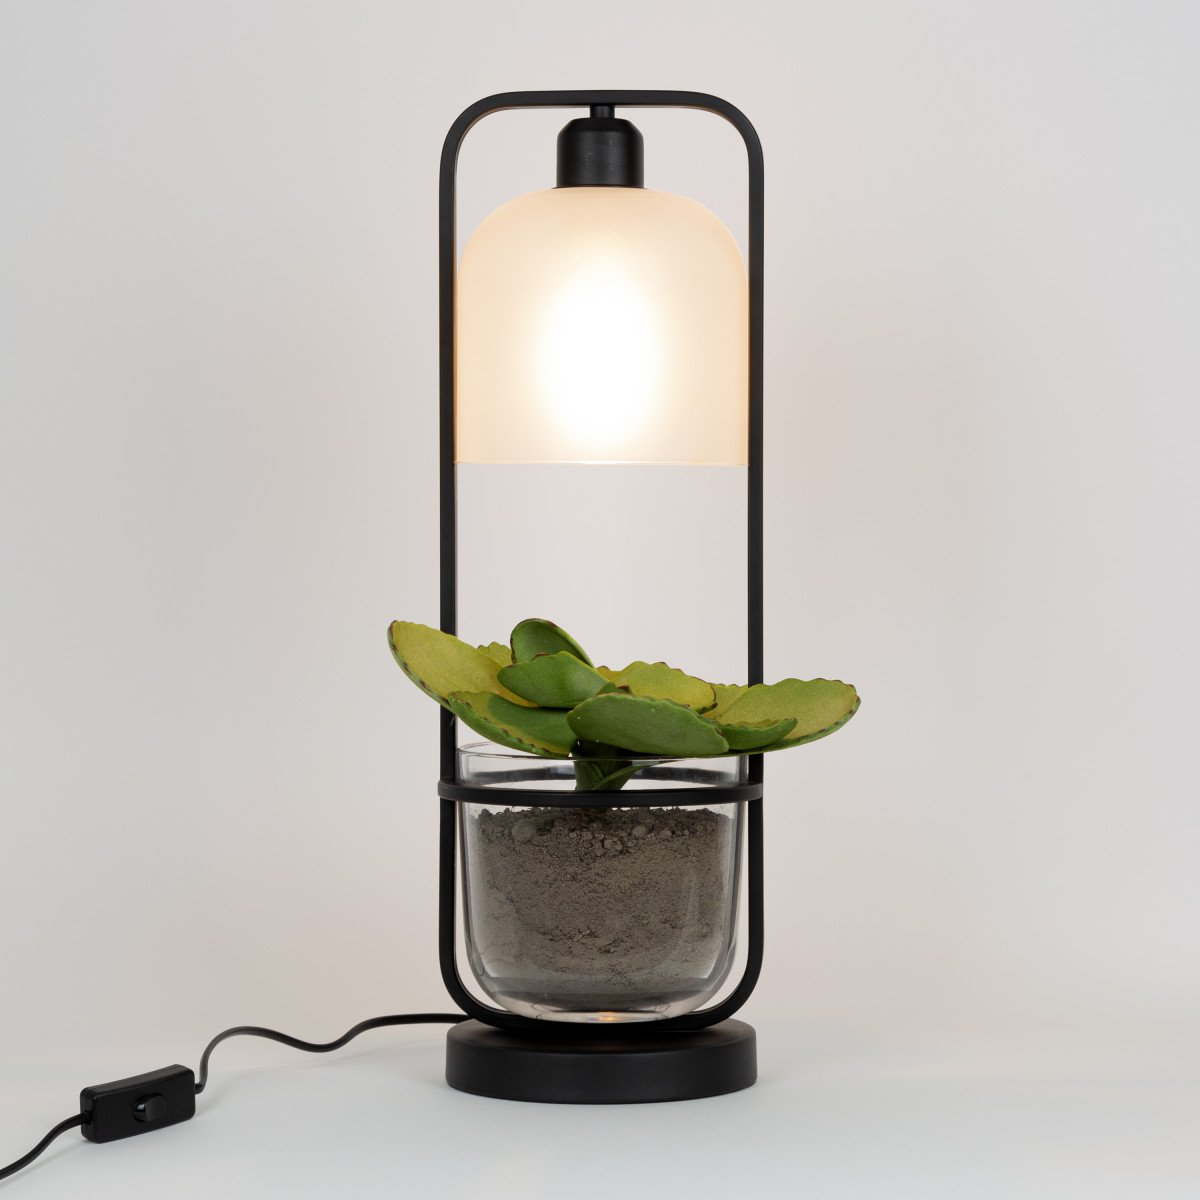 Seeds 3 staande lamp incl. plantenbakje